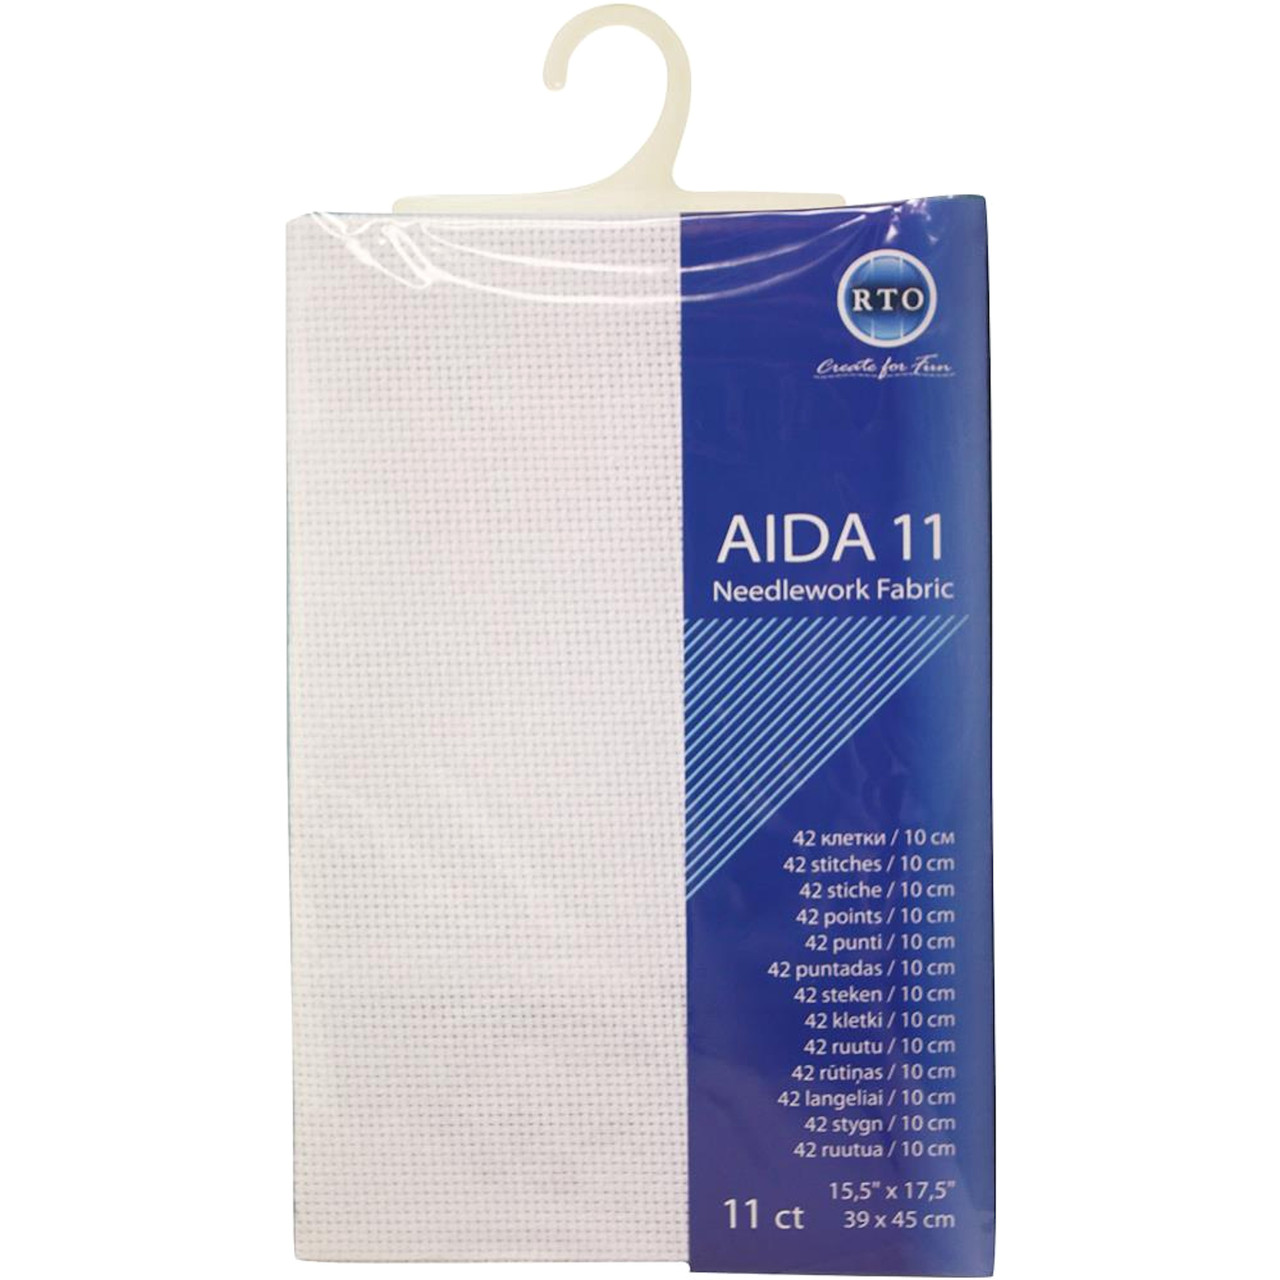 "RTO - White 11 Count Aida Fabric 15.5"" x 17.5"""